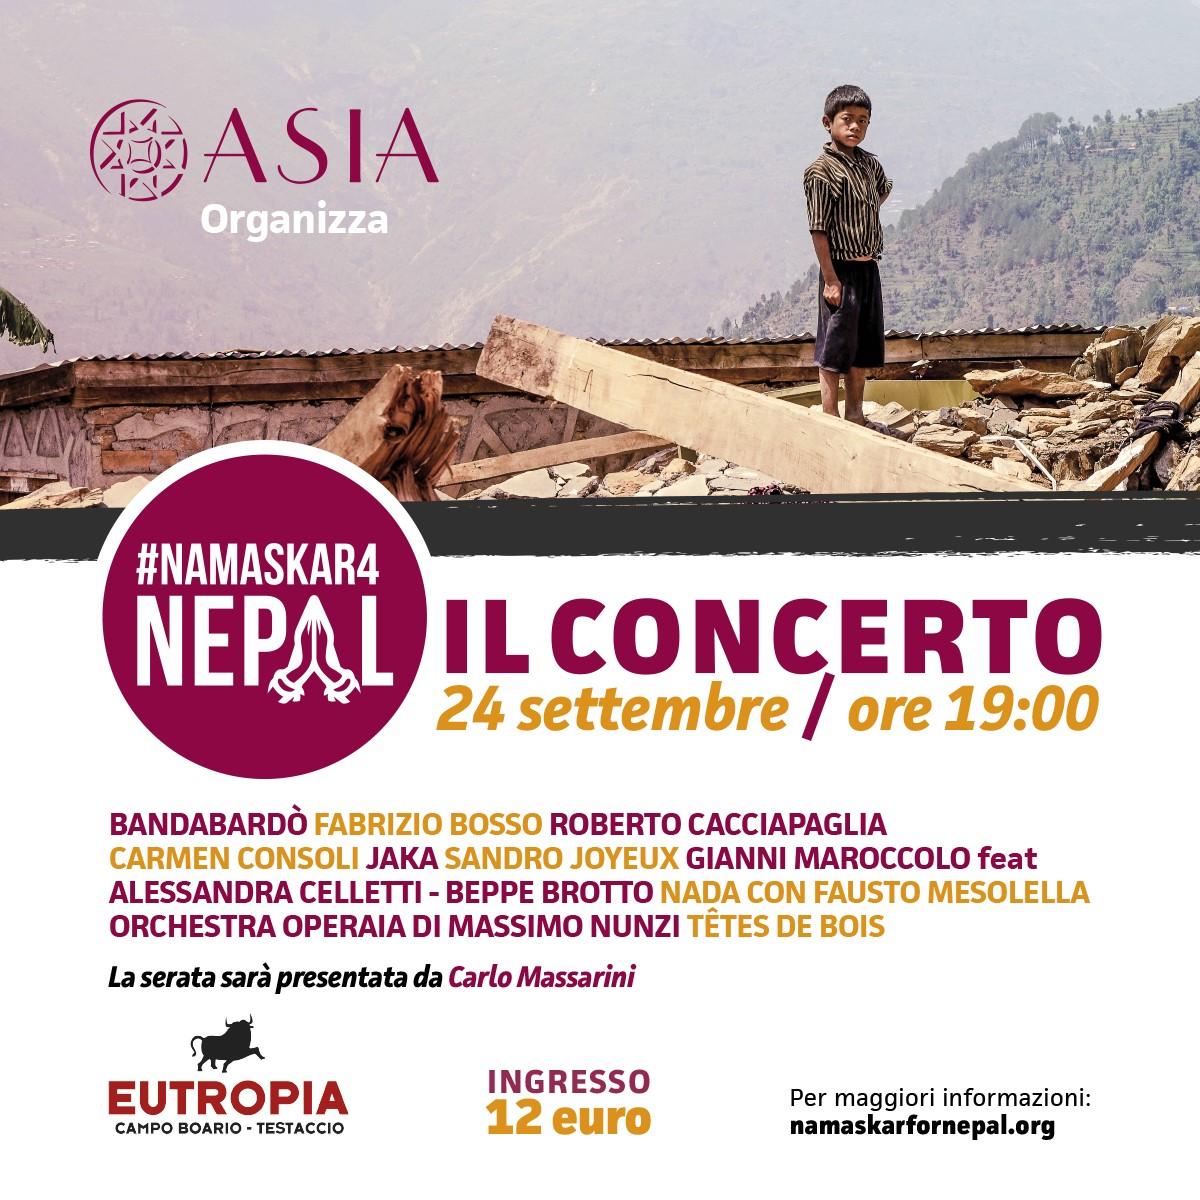 Asia organizza il concerto #namaskar4nepal